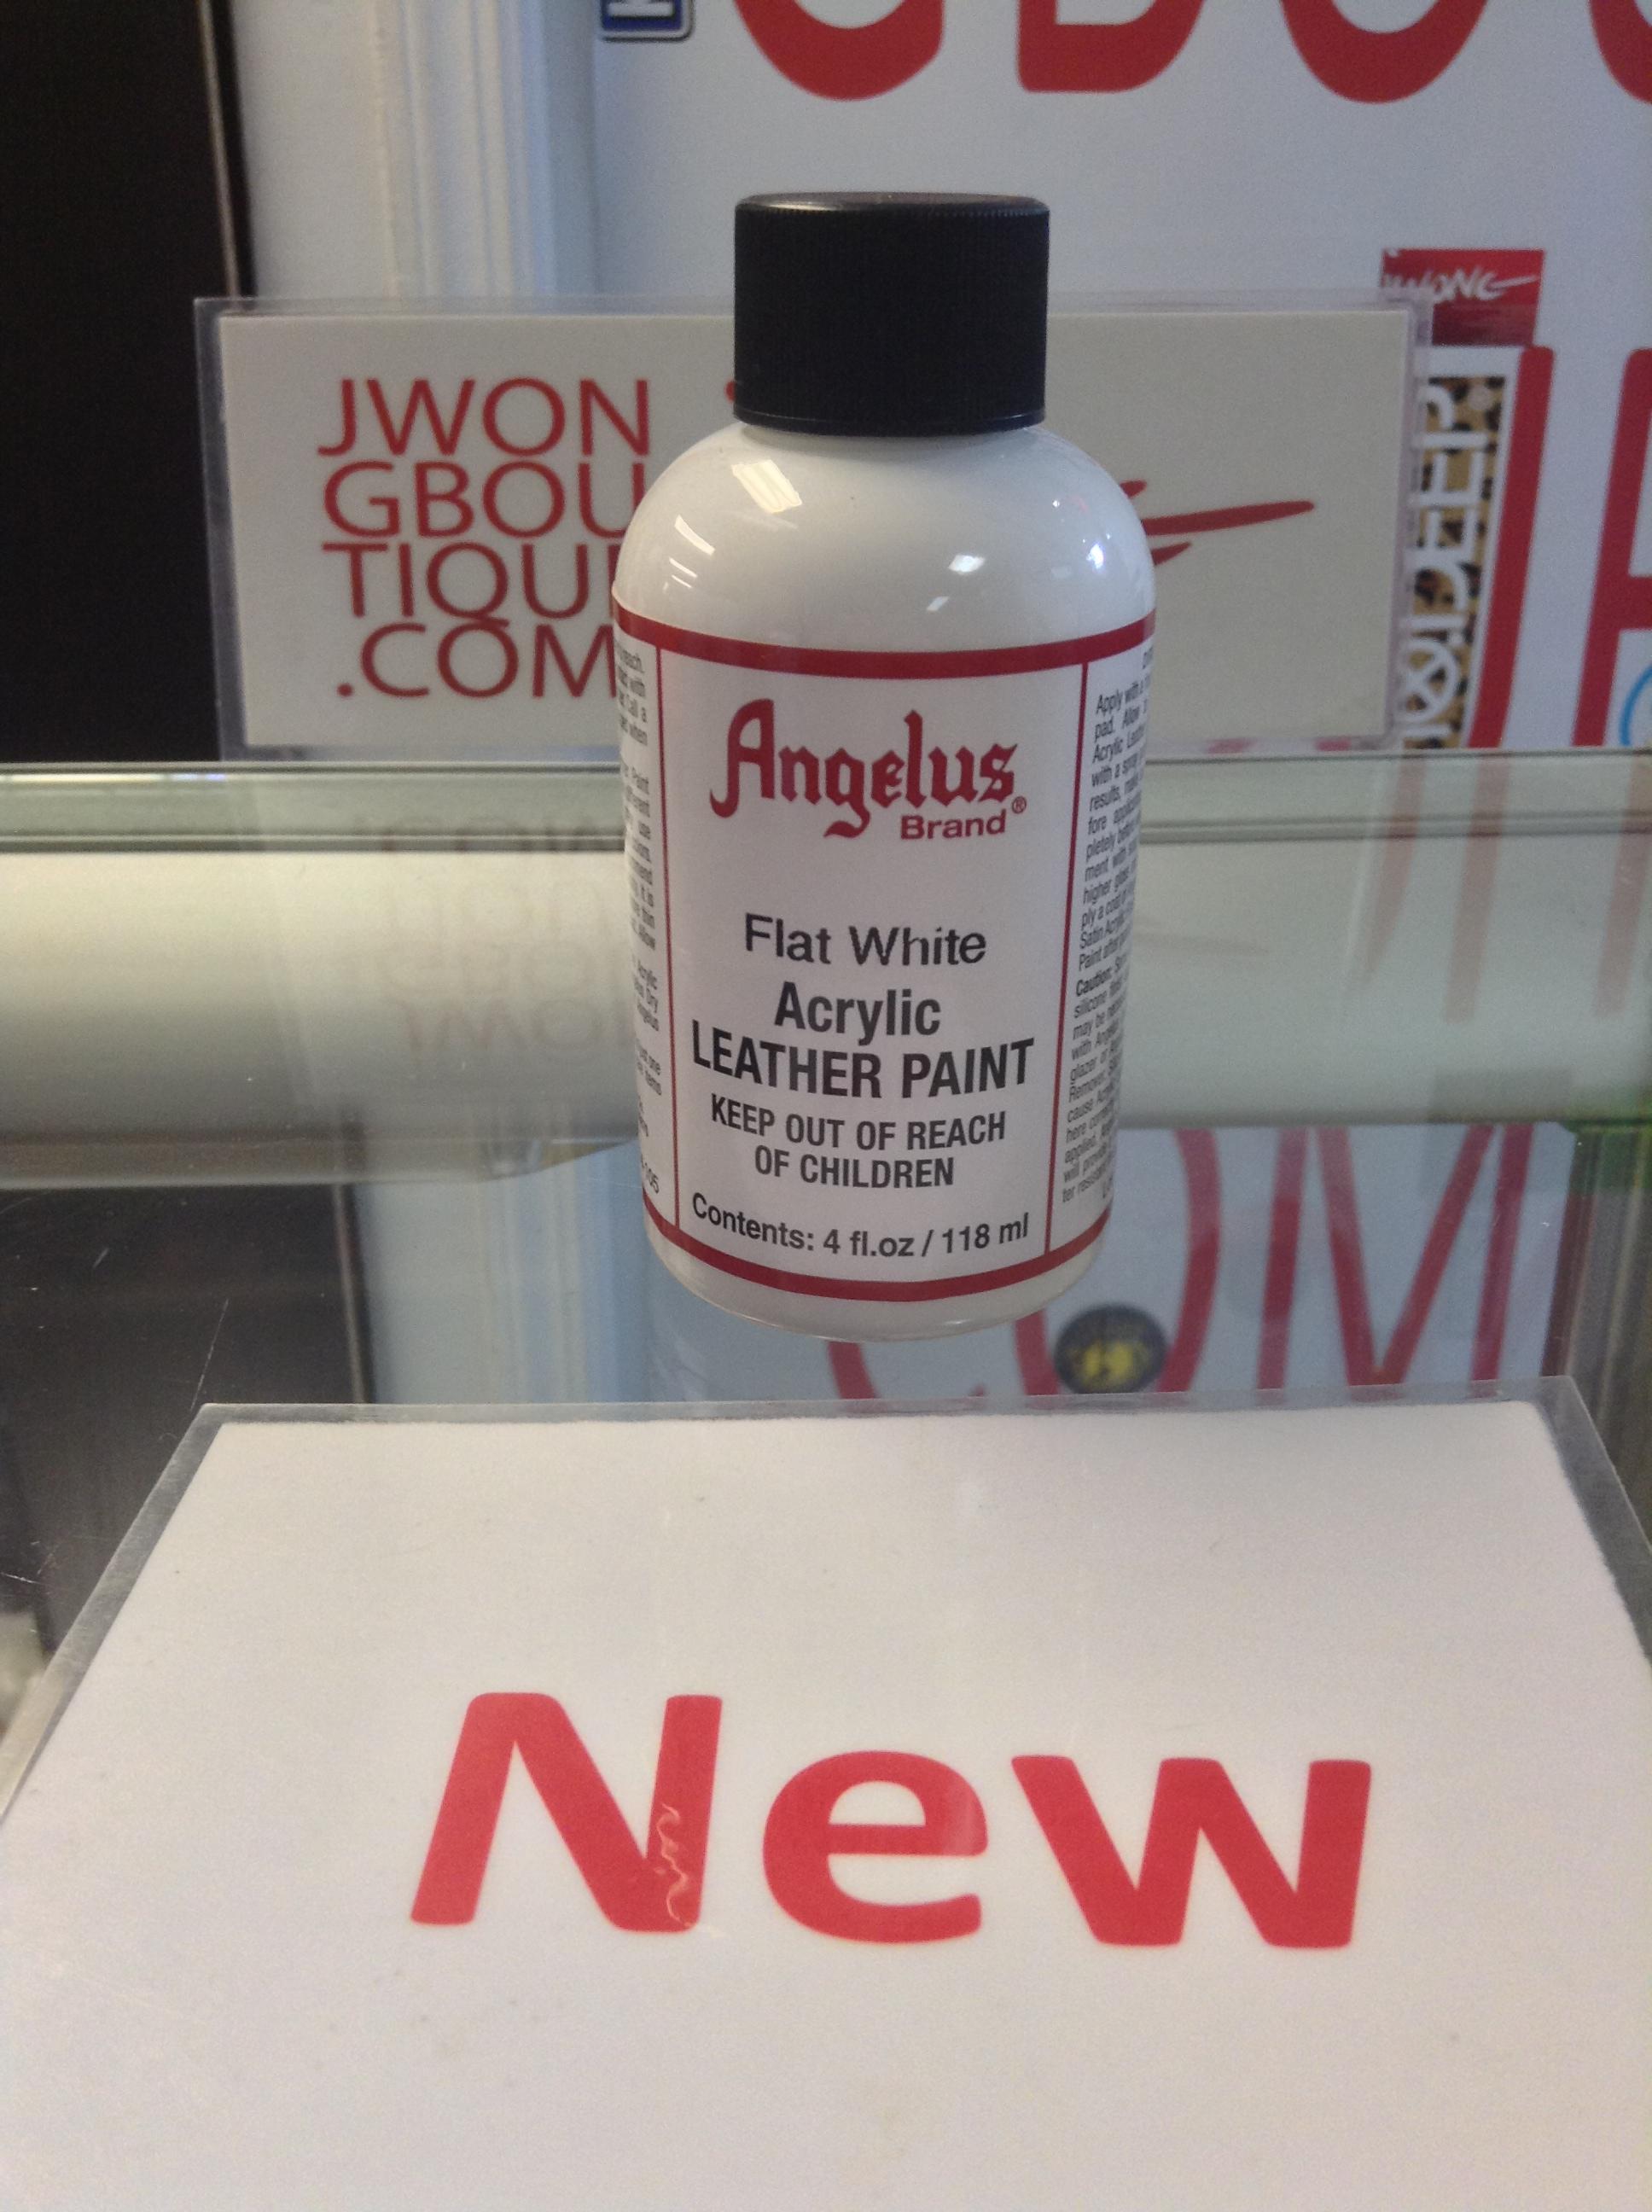 angelus flat white acrylic leather paint 4 fl oz jwong boutique. Black Bedroom Furniture Sets. Home Design Ideas